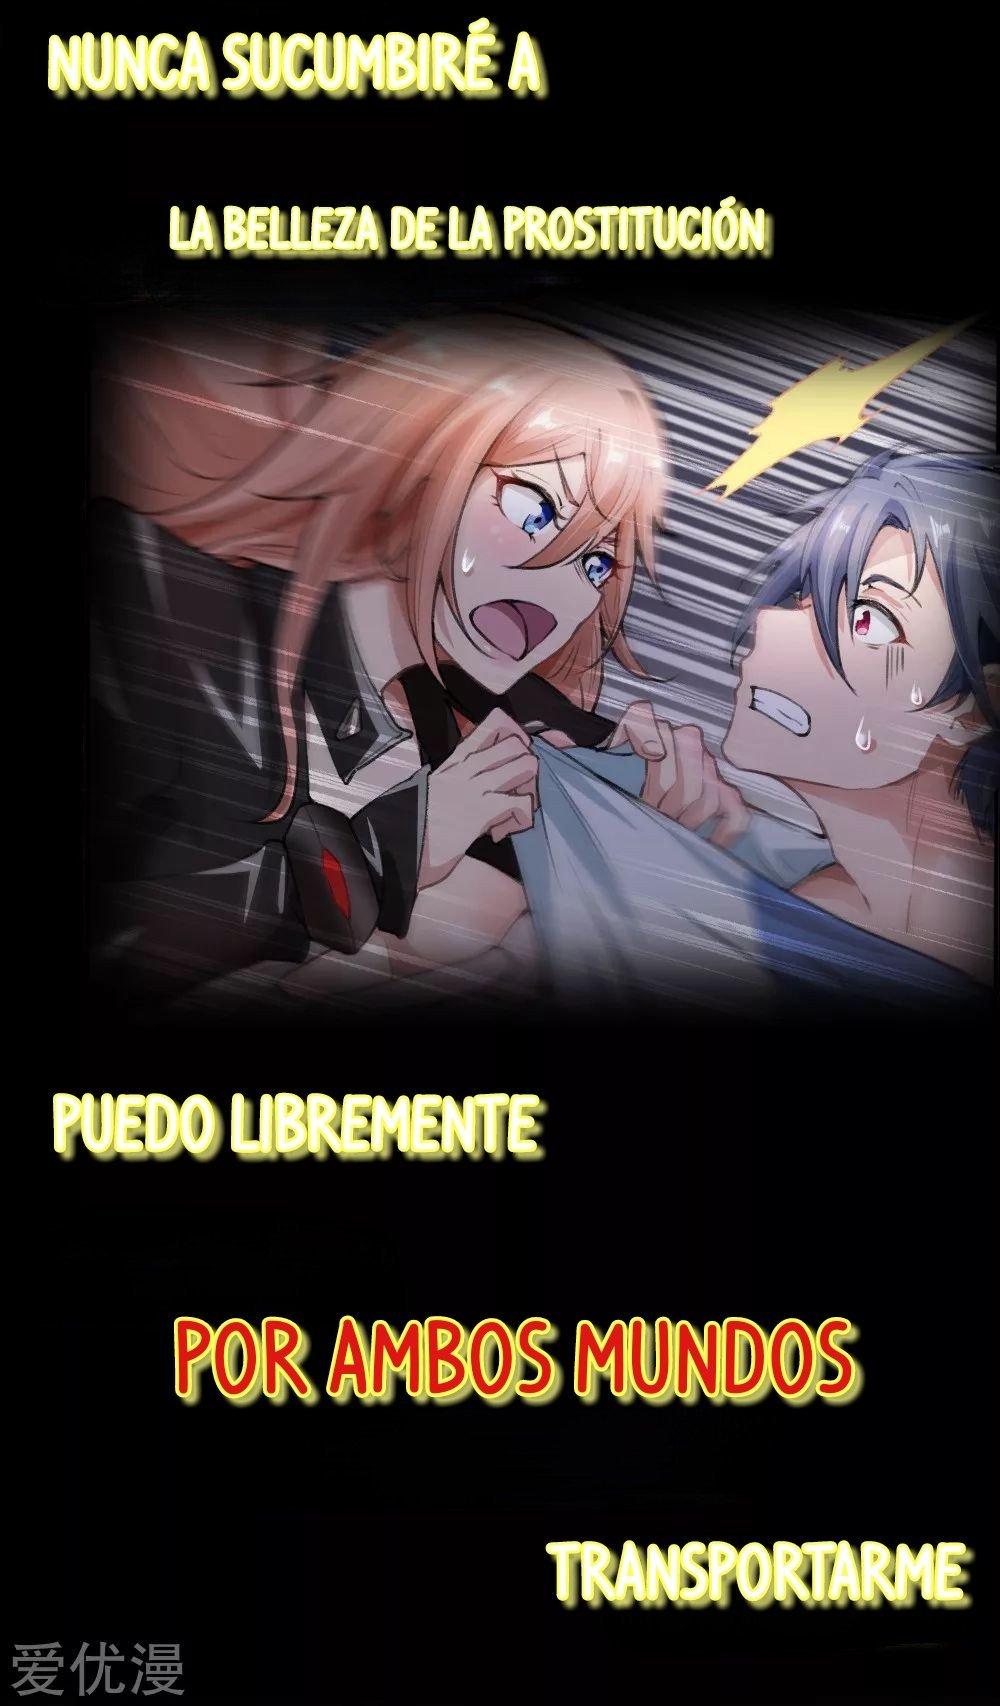 https://nine.mangadogs.com/es_manga/pic8/58/36666/946503/add7a048049671970976f3e18f21ade3.jpg Page 4